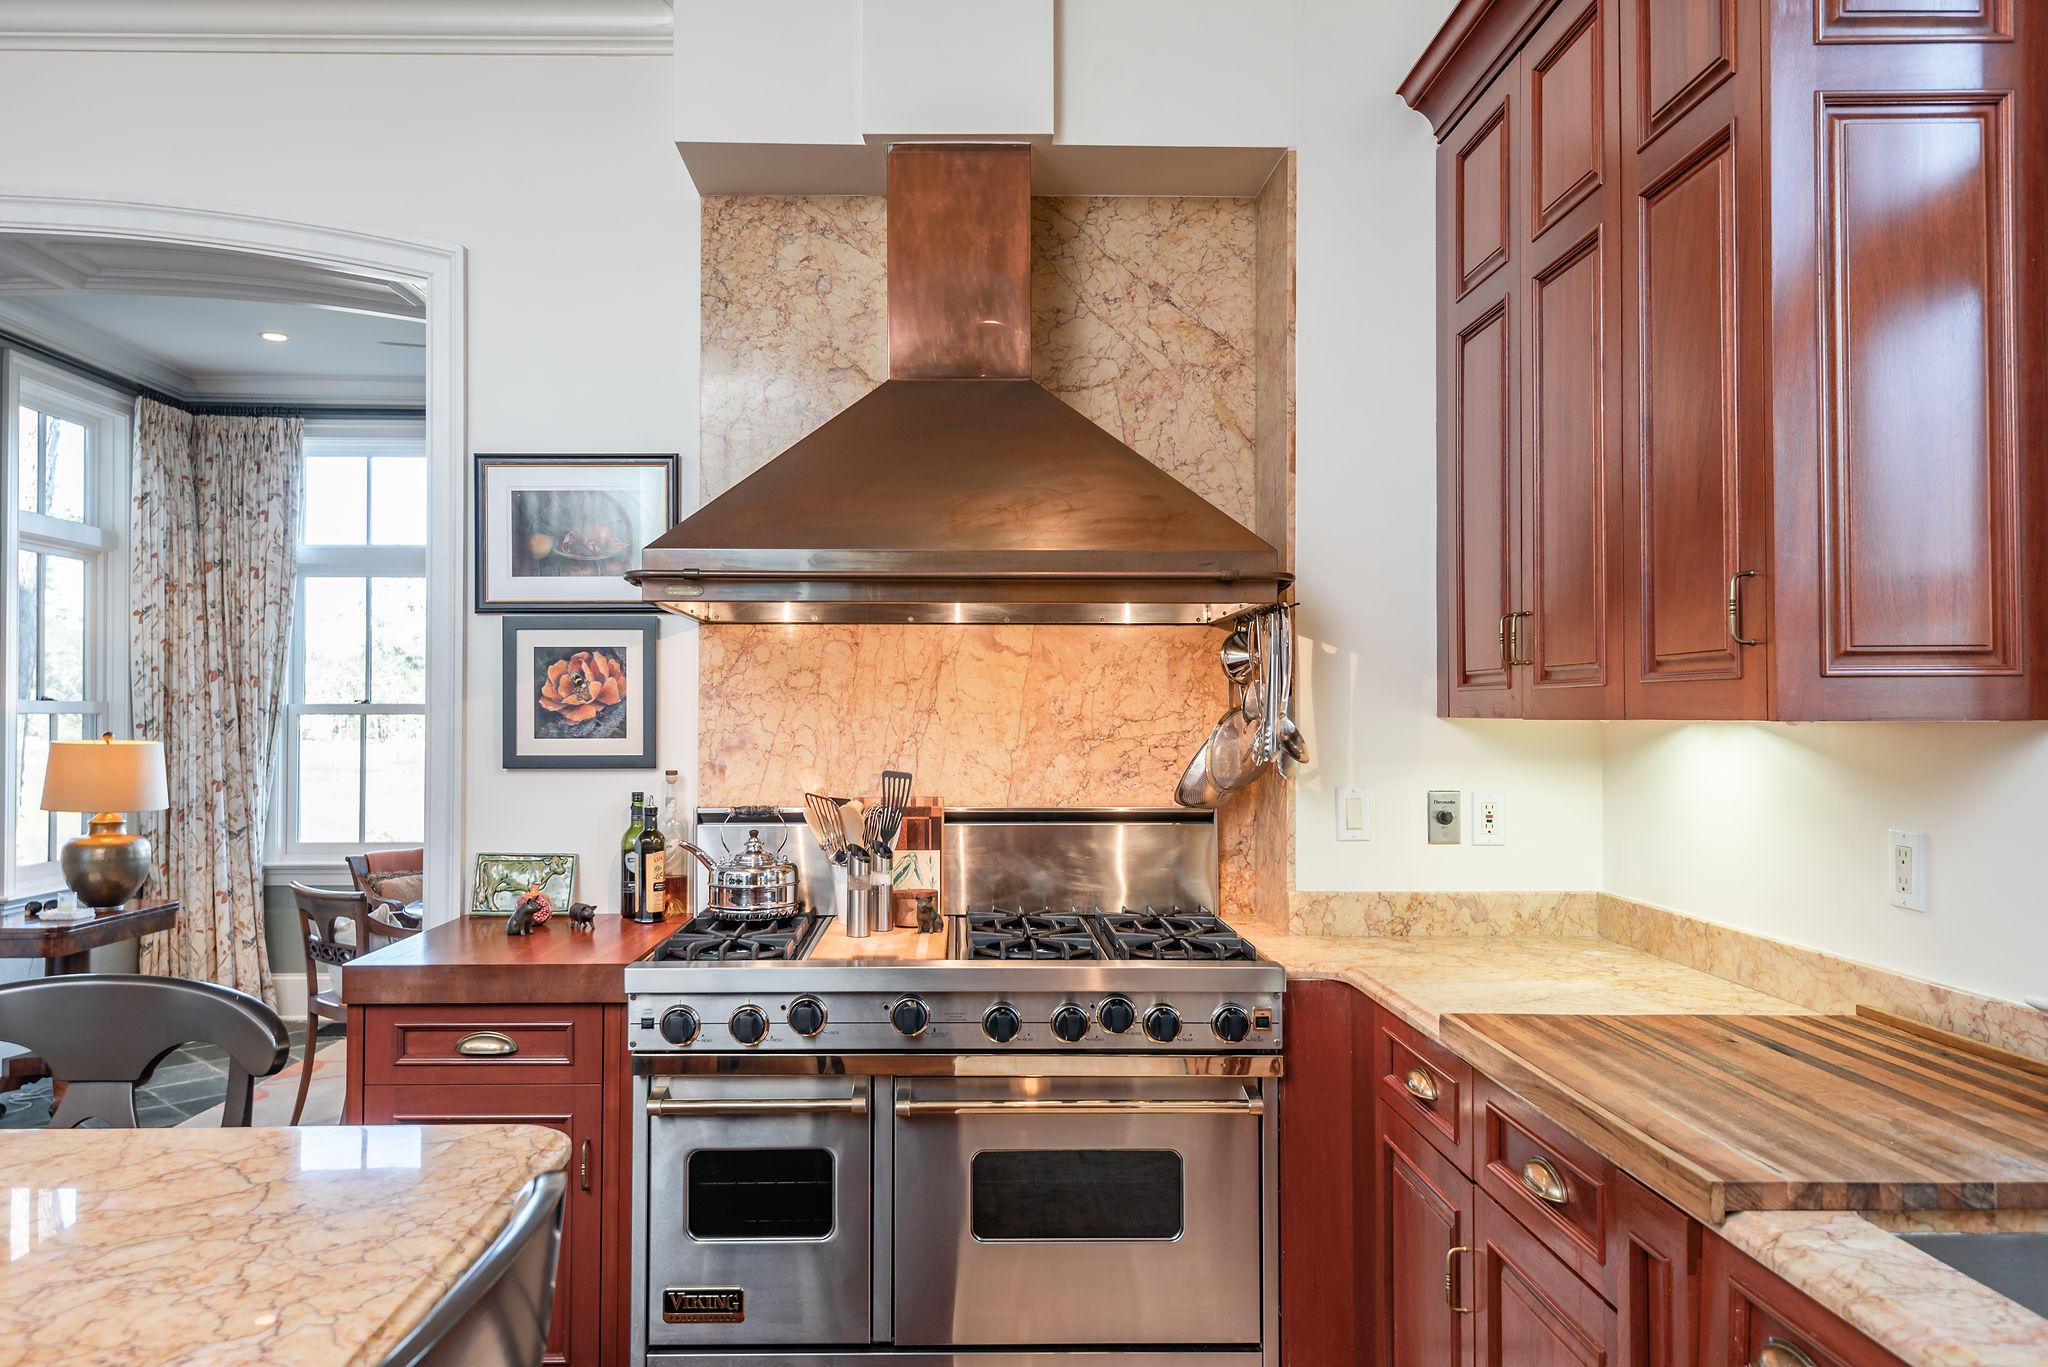 Kiawah Island Homes For Sale - 42 Salt Cedar, Kiawah Island, SC - 42